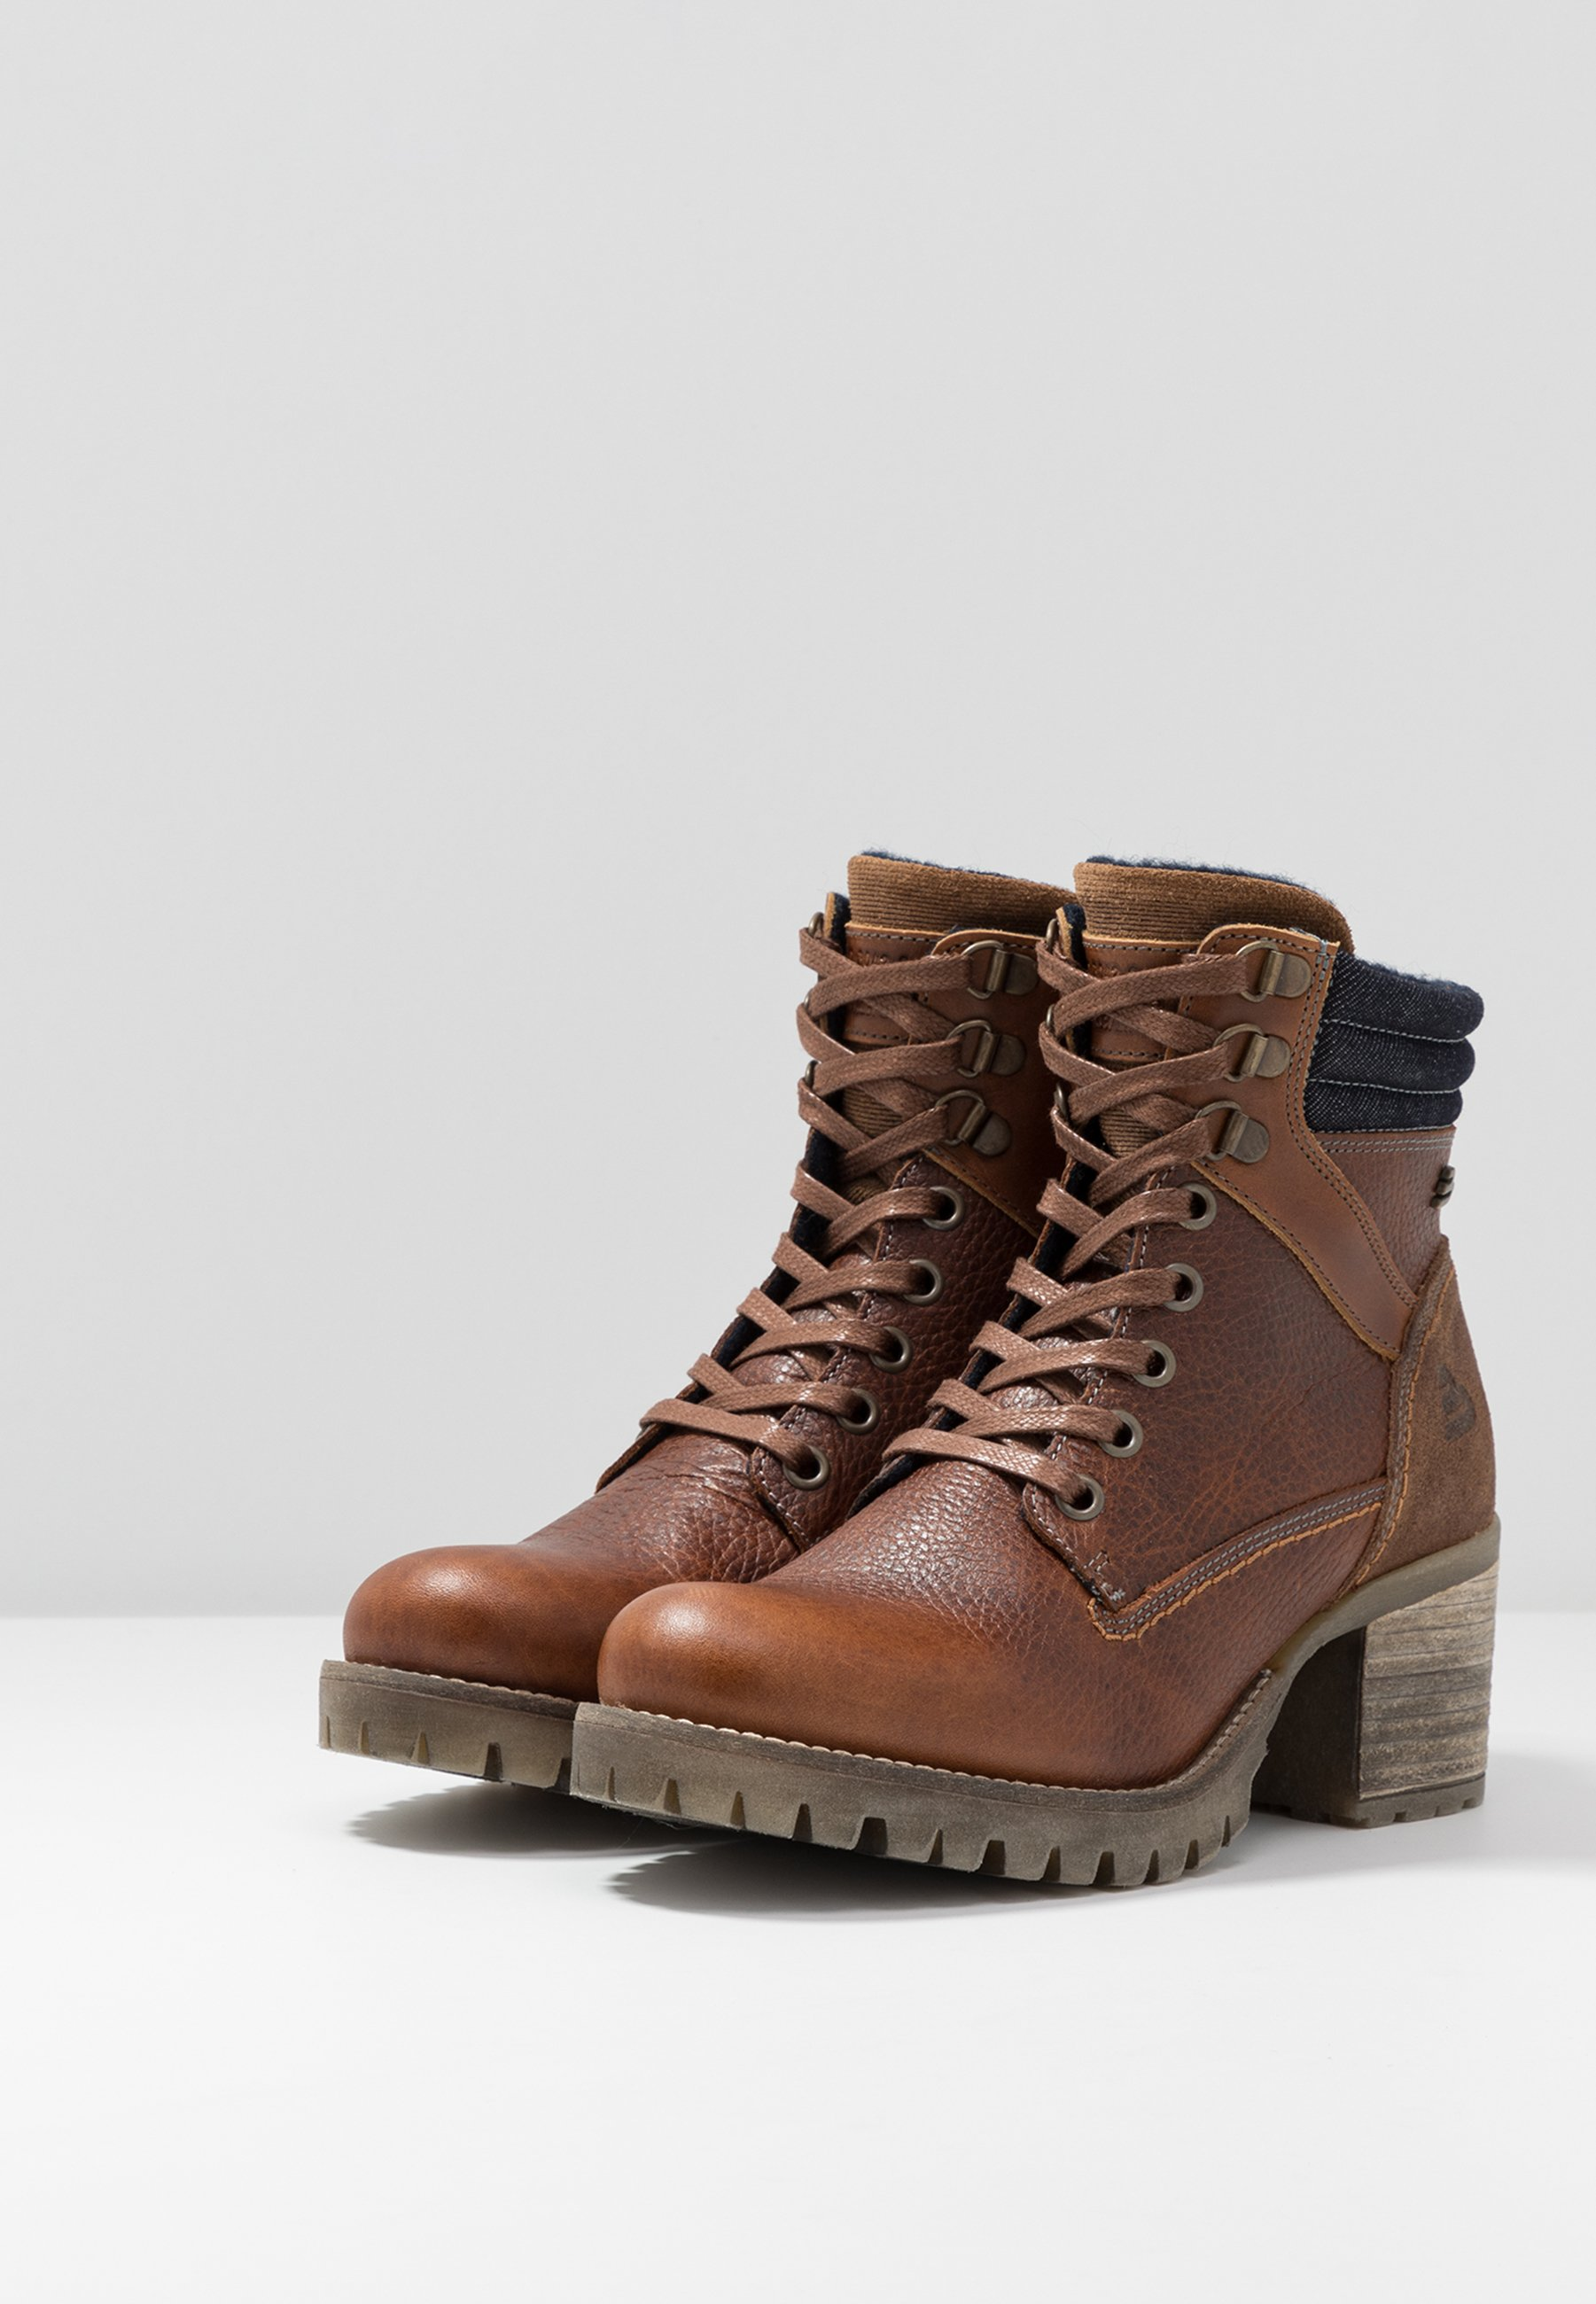 Bullboxer Nilkkurit - cognac - Naisten kengät 5QZO1